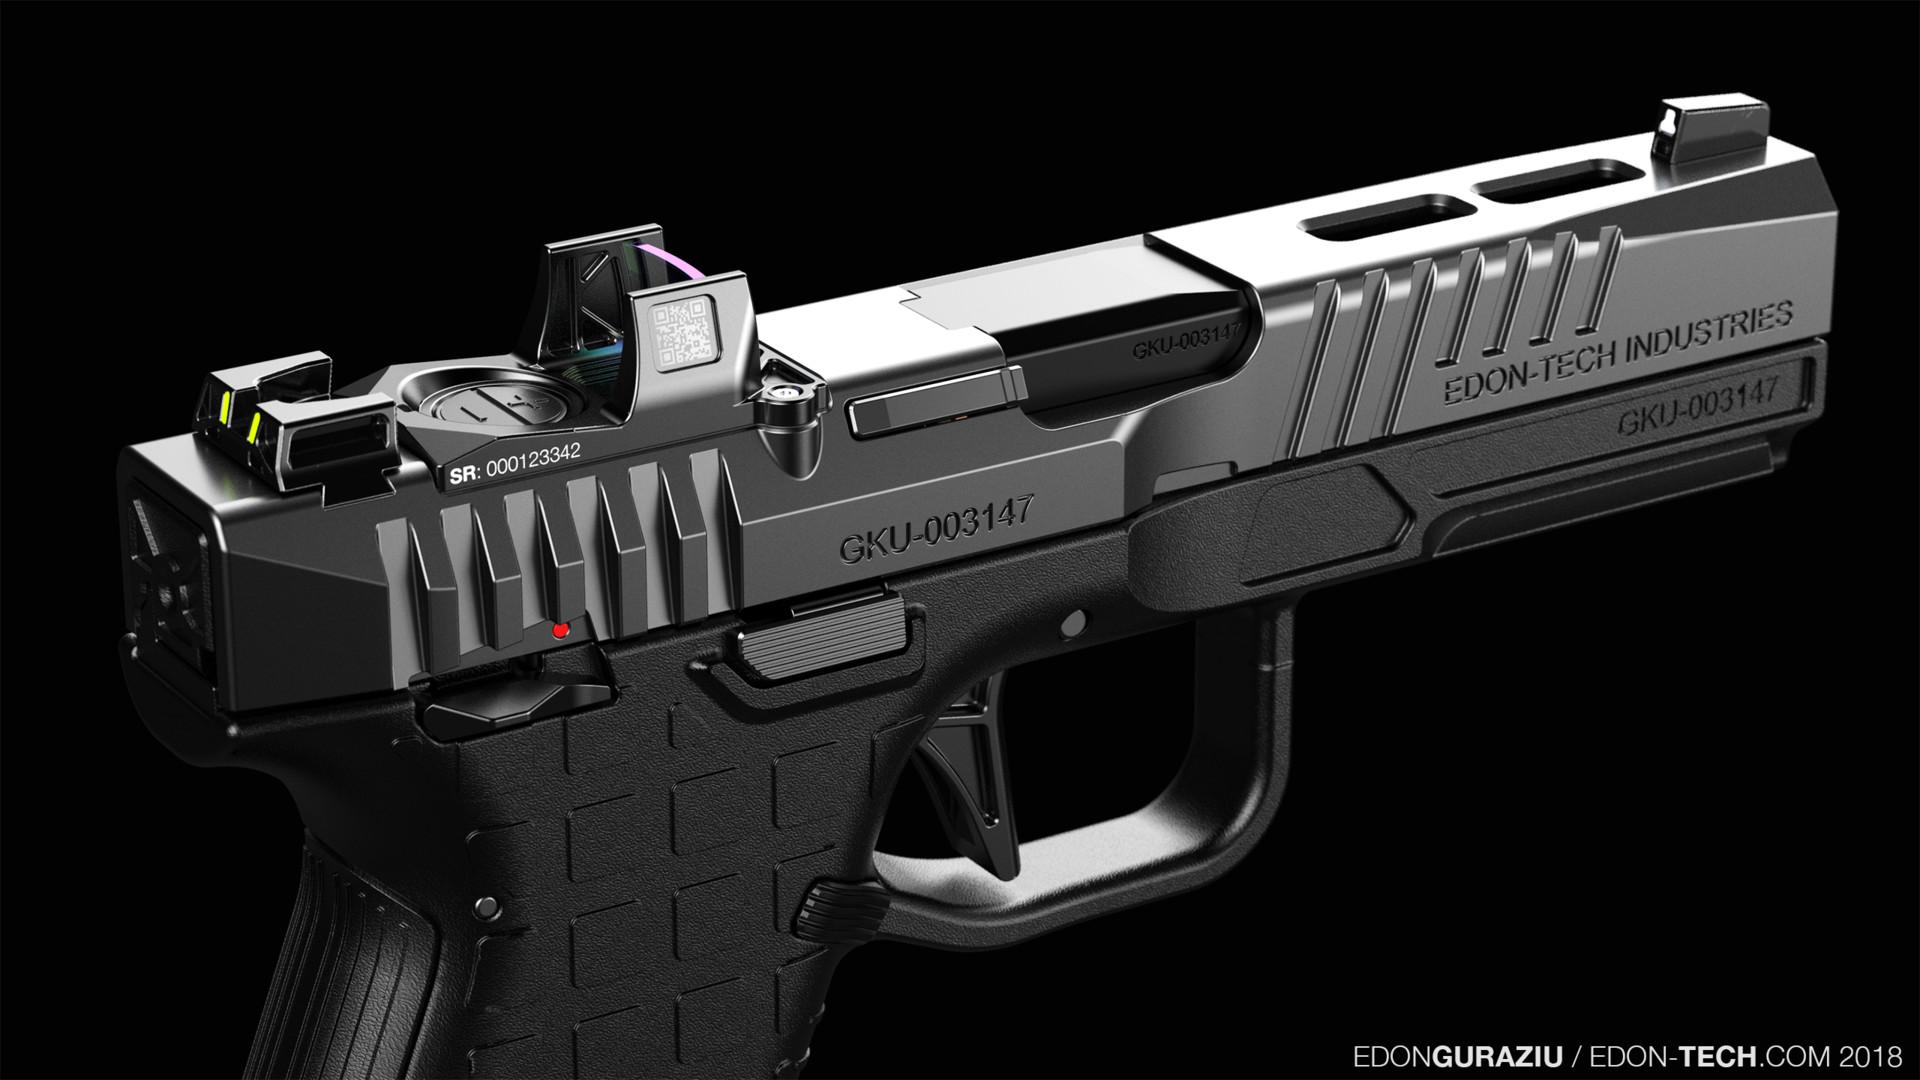 Edon guraziu nra pistol image 001